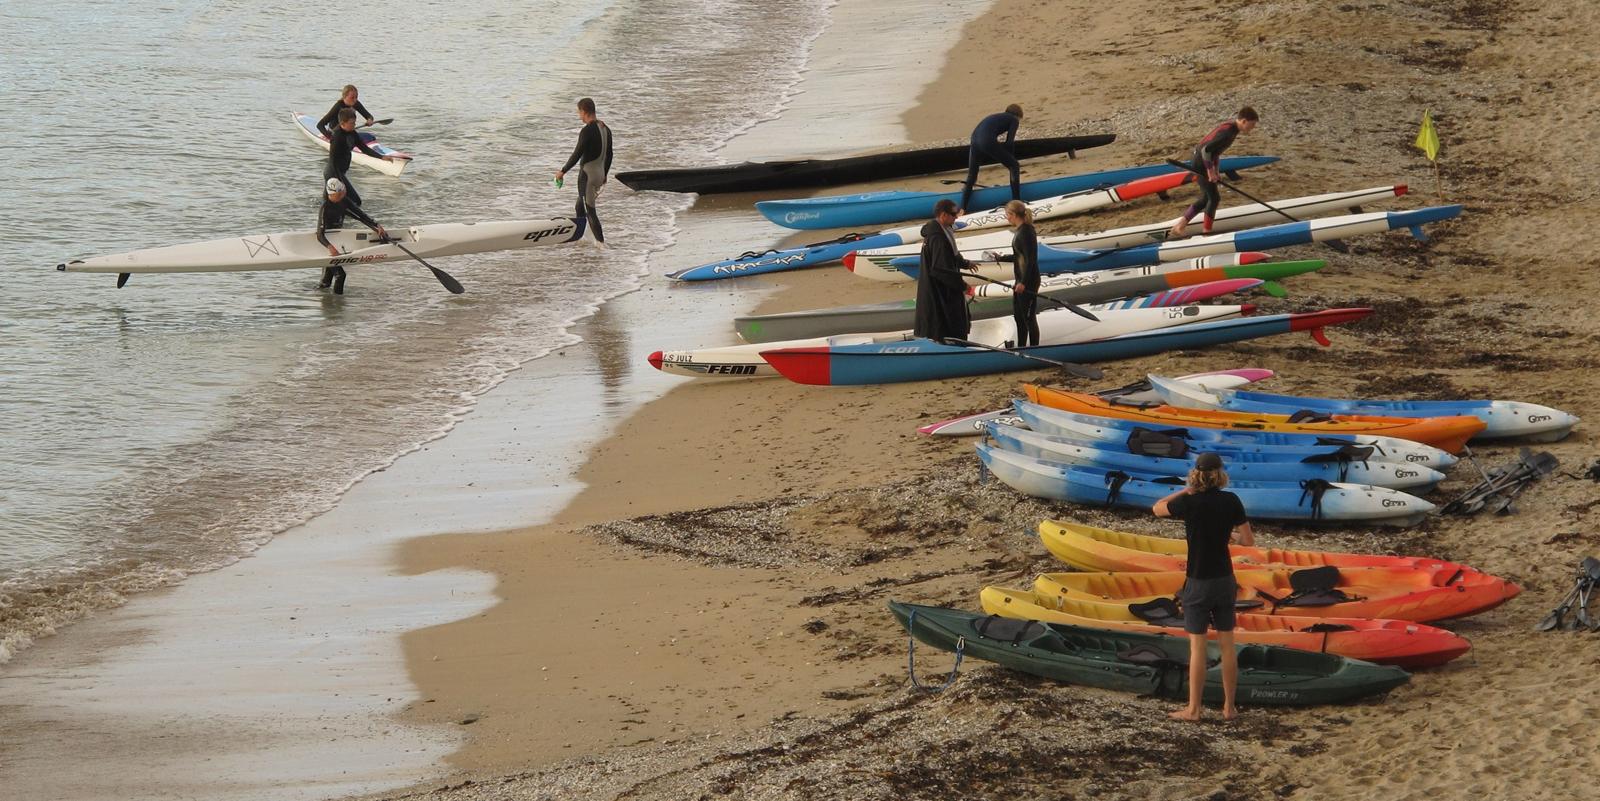 Gyllyngvase Beach Sept 2020 - Raymond